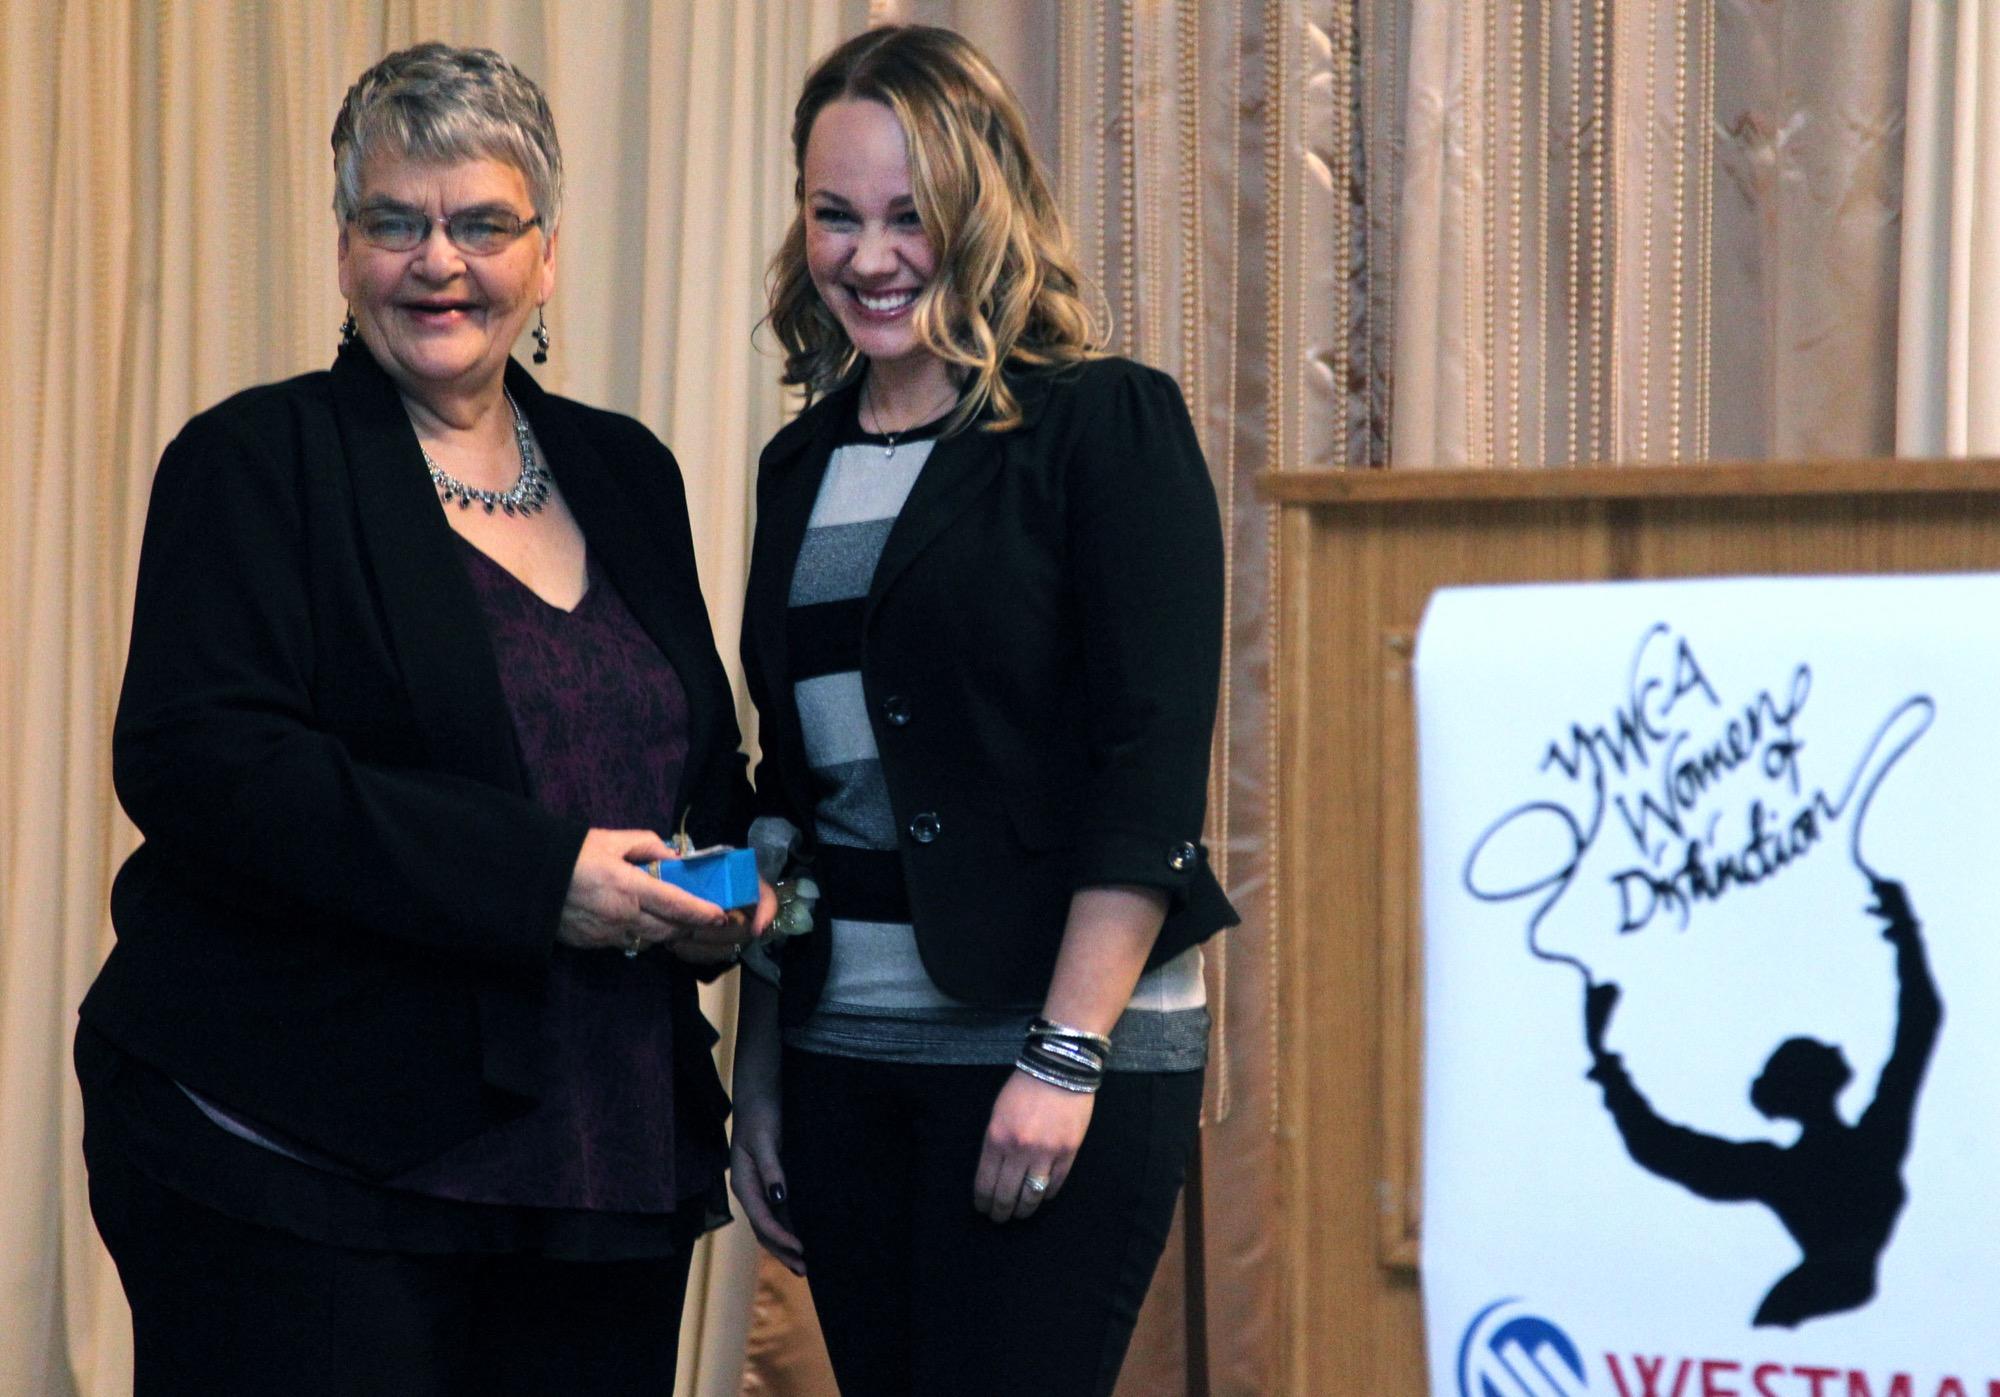 170303+YWCA+awards+winner+b